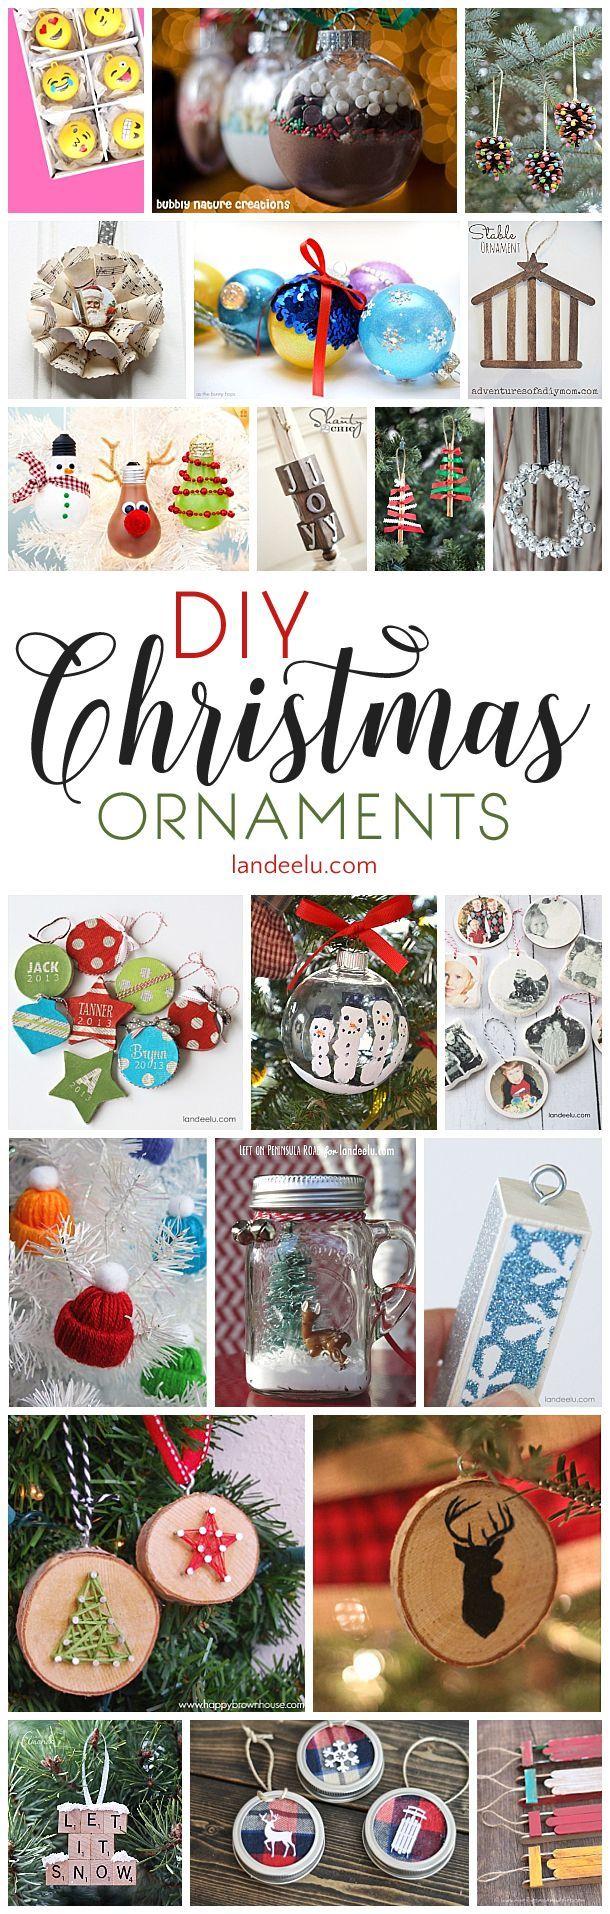 Diy christmas ornaments to make for a festive do it yourself holiday diy christmas ornaments to make for a festive do it yourself holiday cheap easy and solutioingenieria Choice Image